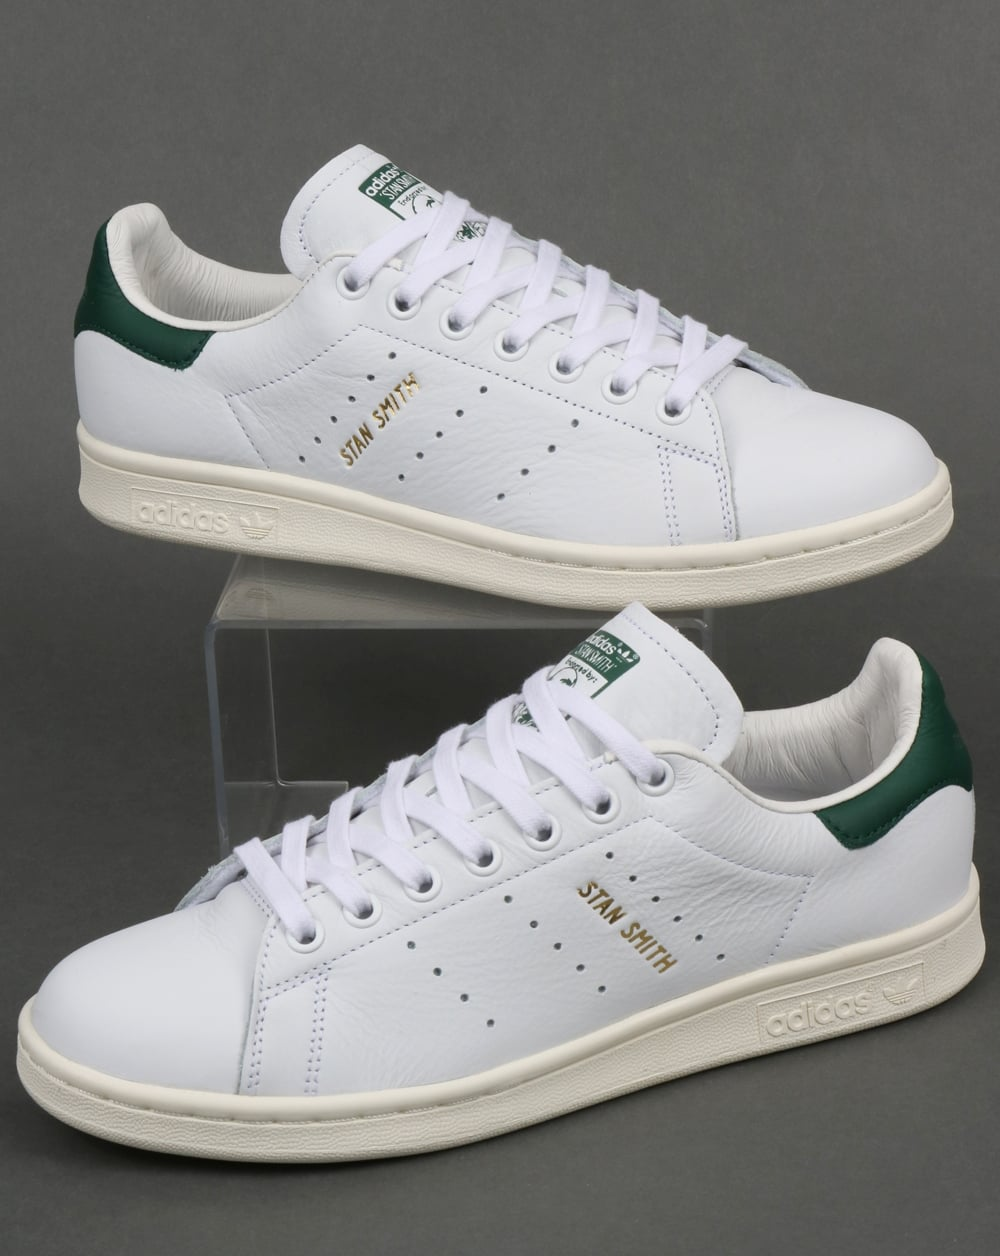 Adidas Stan Smith Trainers White